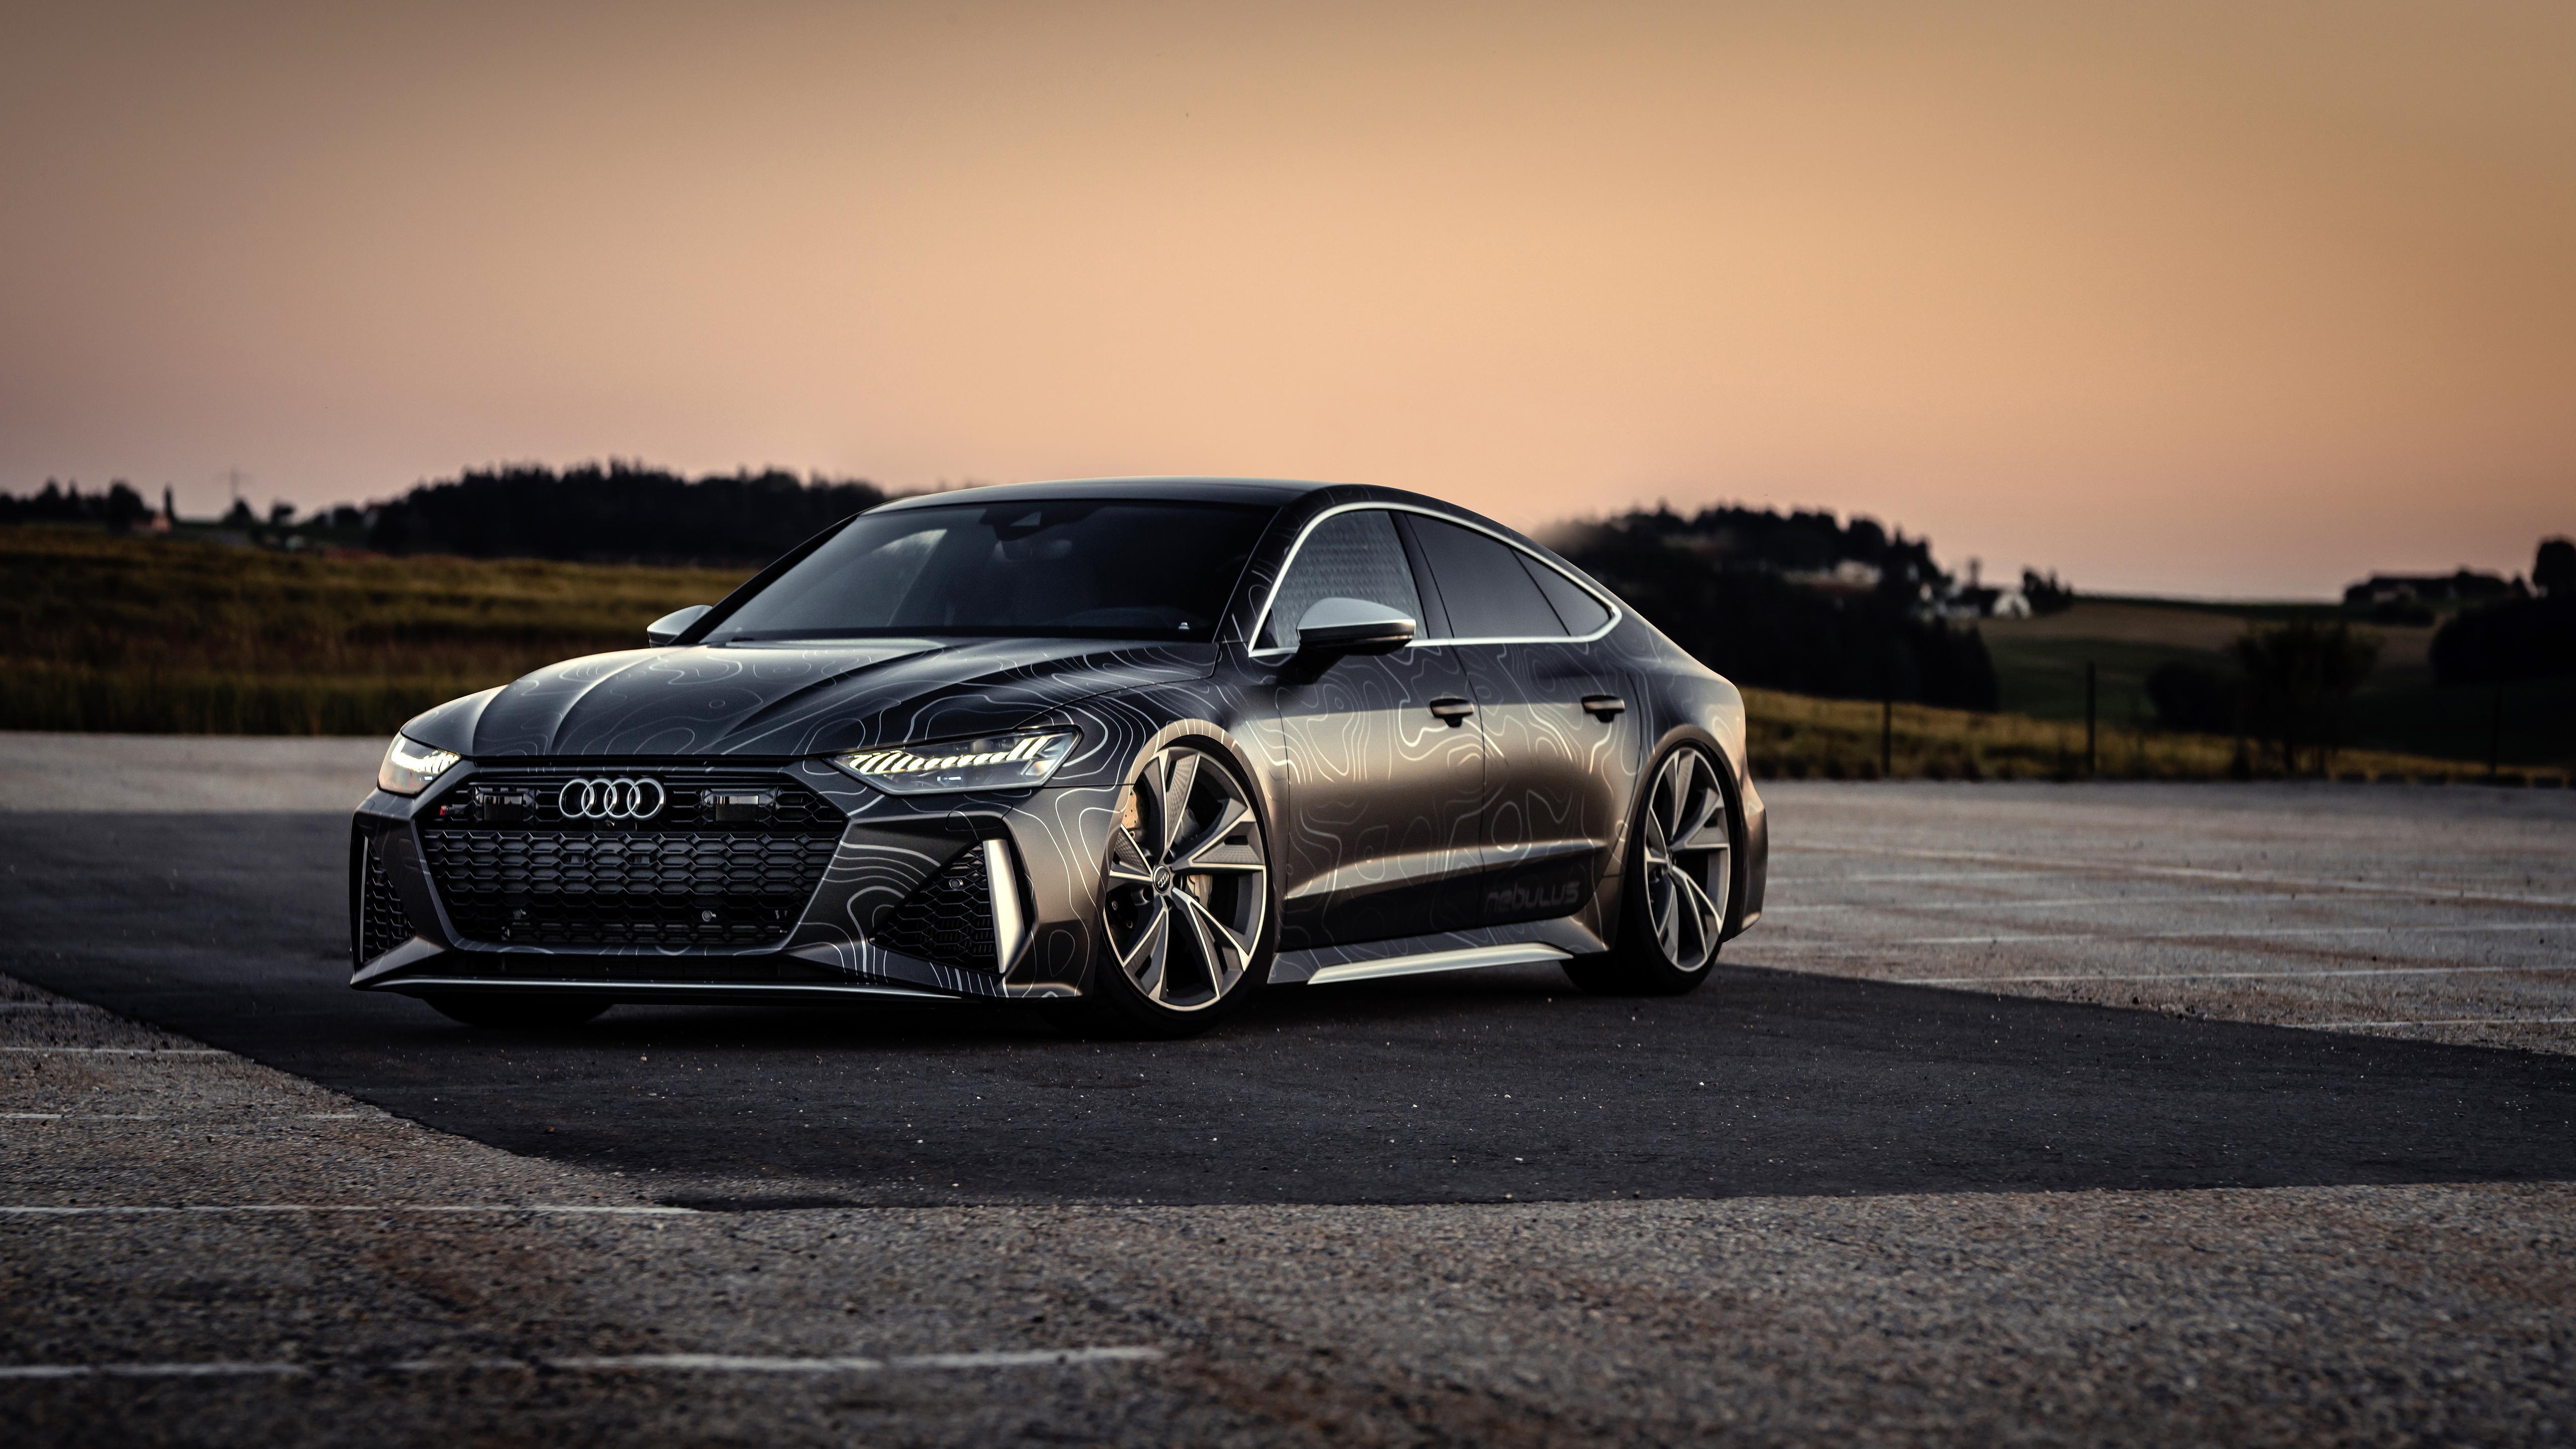 Black Box Richter Audi Rs 7 Sportback 2020 5k Wallpaper Hd Car Wallpapers Id 15421